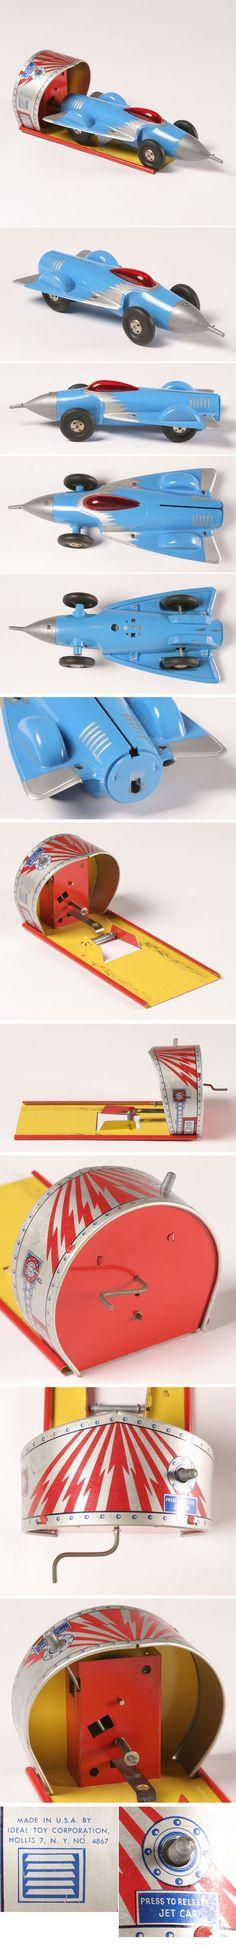 Ideal Toy Mechanical Jet Car Plastic Tin